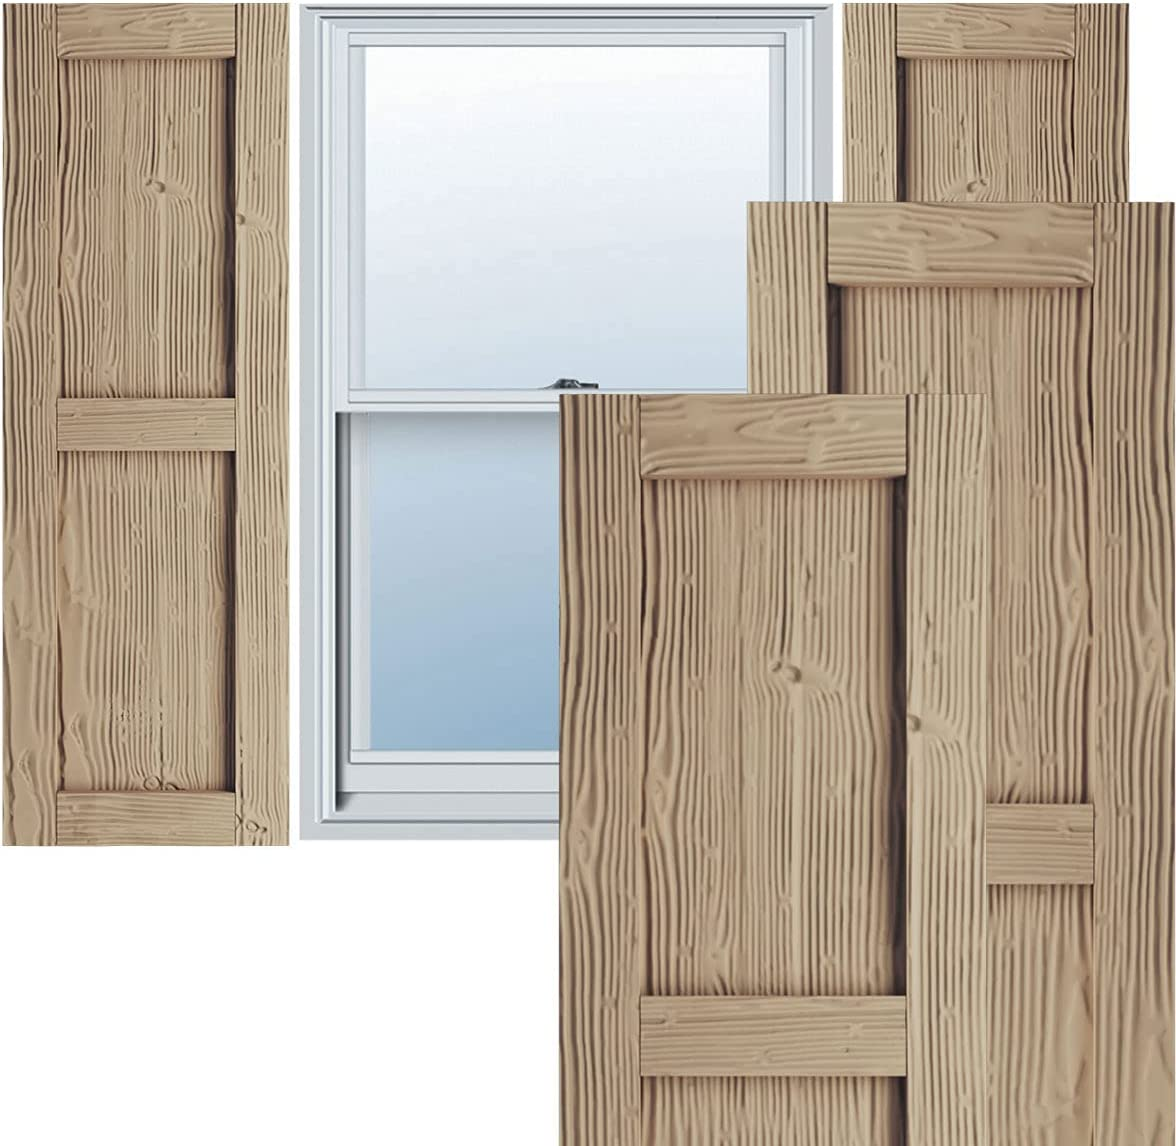 Ekena Millwork SHULVPC Faux Ranking TOP7 New life Wood Pair Rustic Per Two Shutters